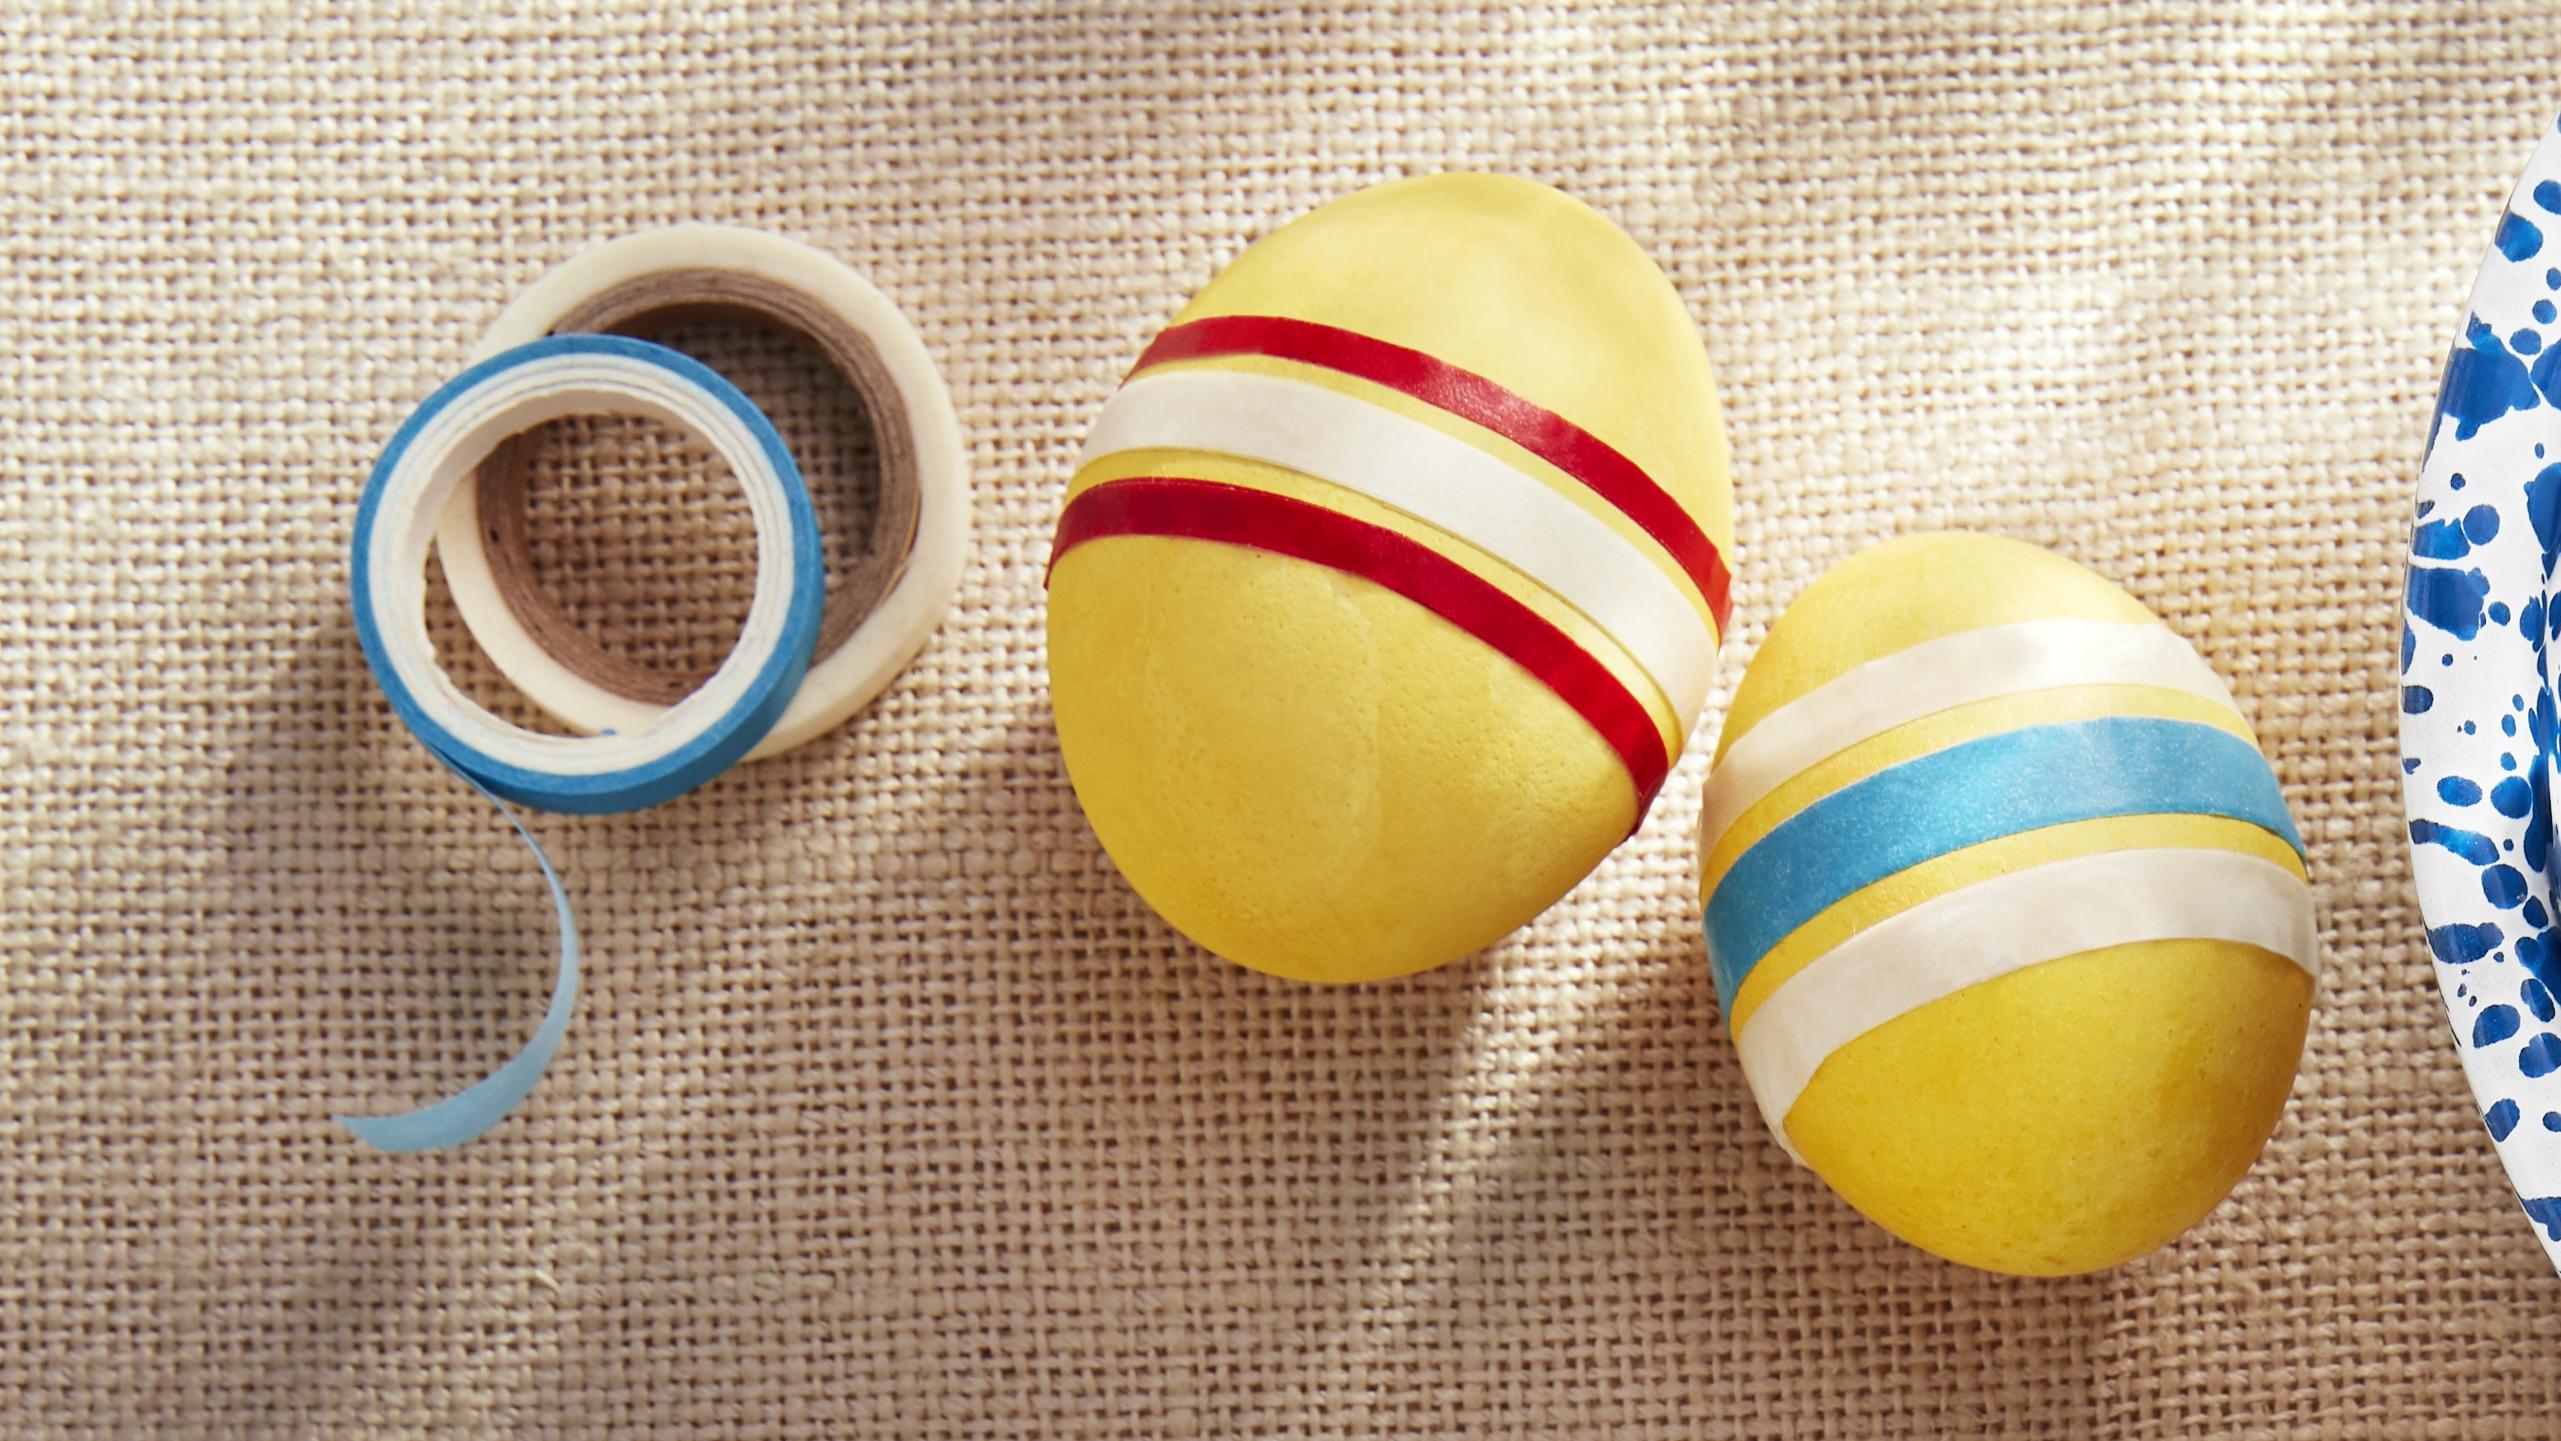 10 Cute Cool Easter Egg Decorating Ideas 60 fun easter egg designs creative ideas for easter egg 1 2020